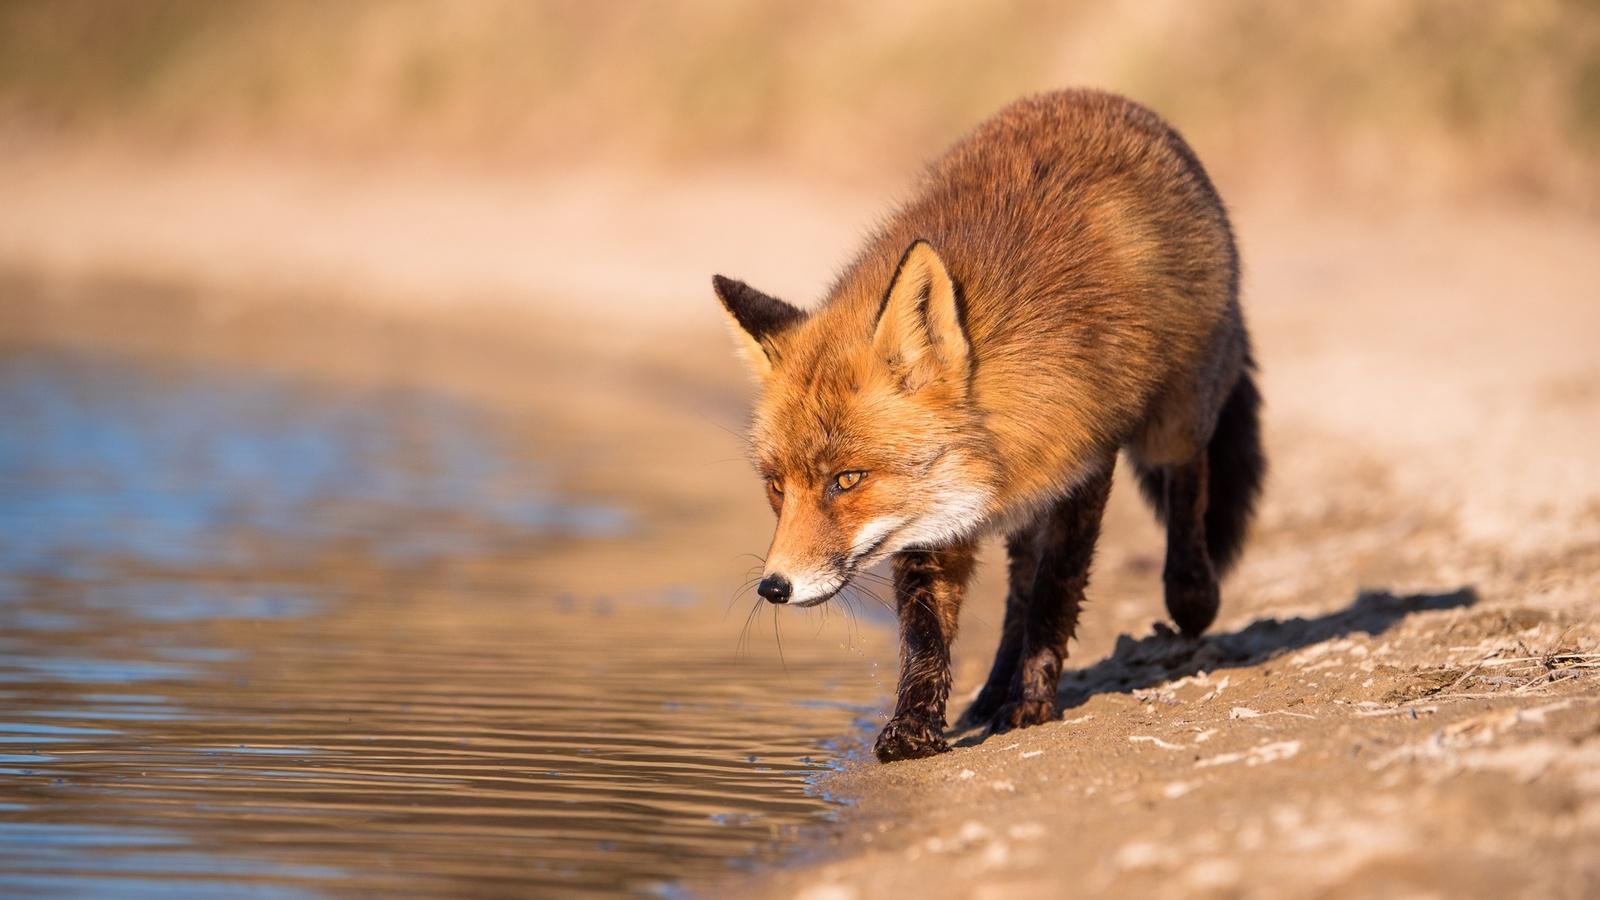 животное, хищник, лиса, лисица, взгляд, природа, вода